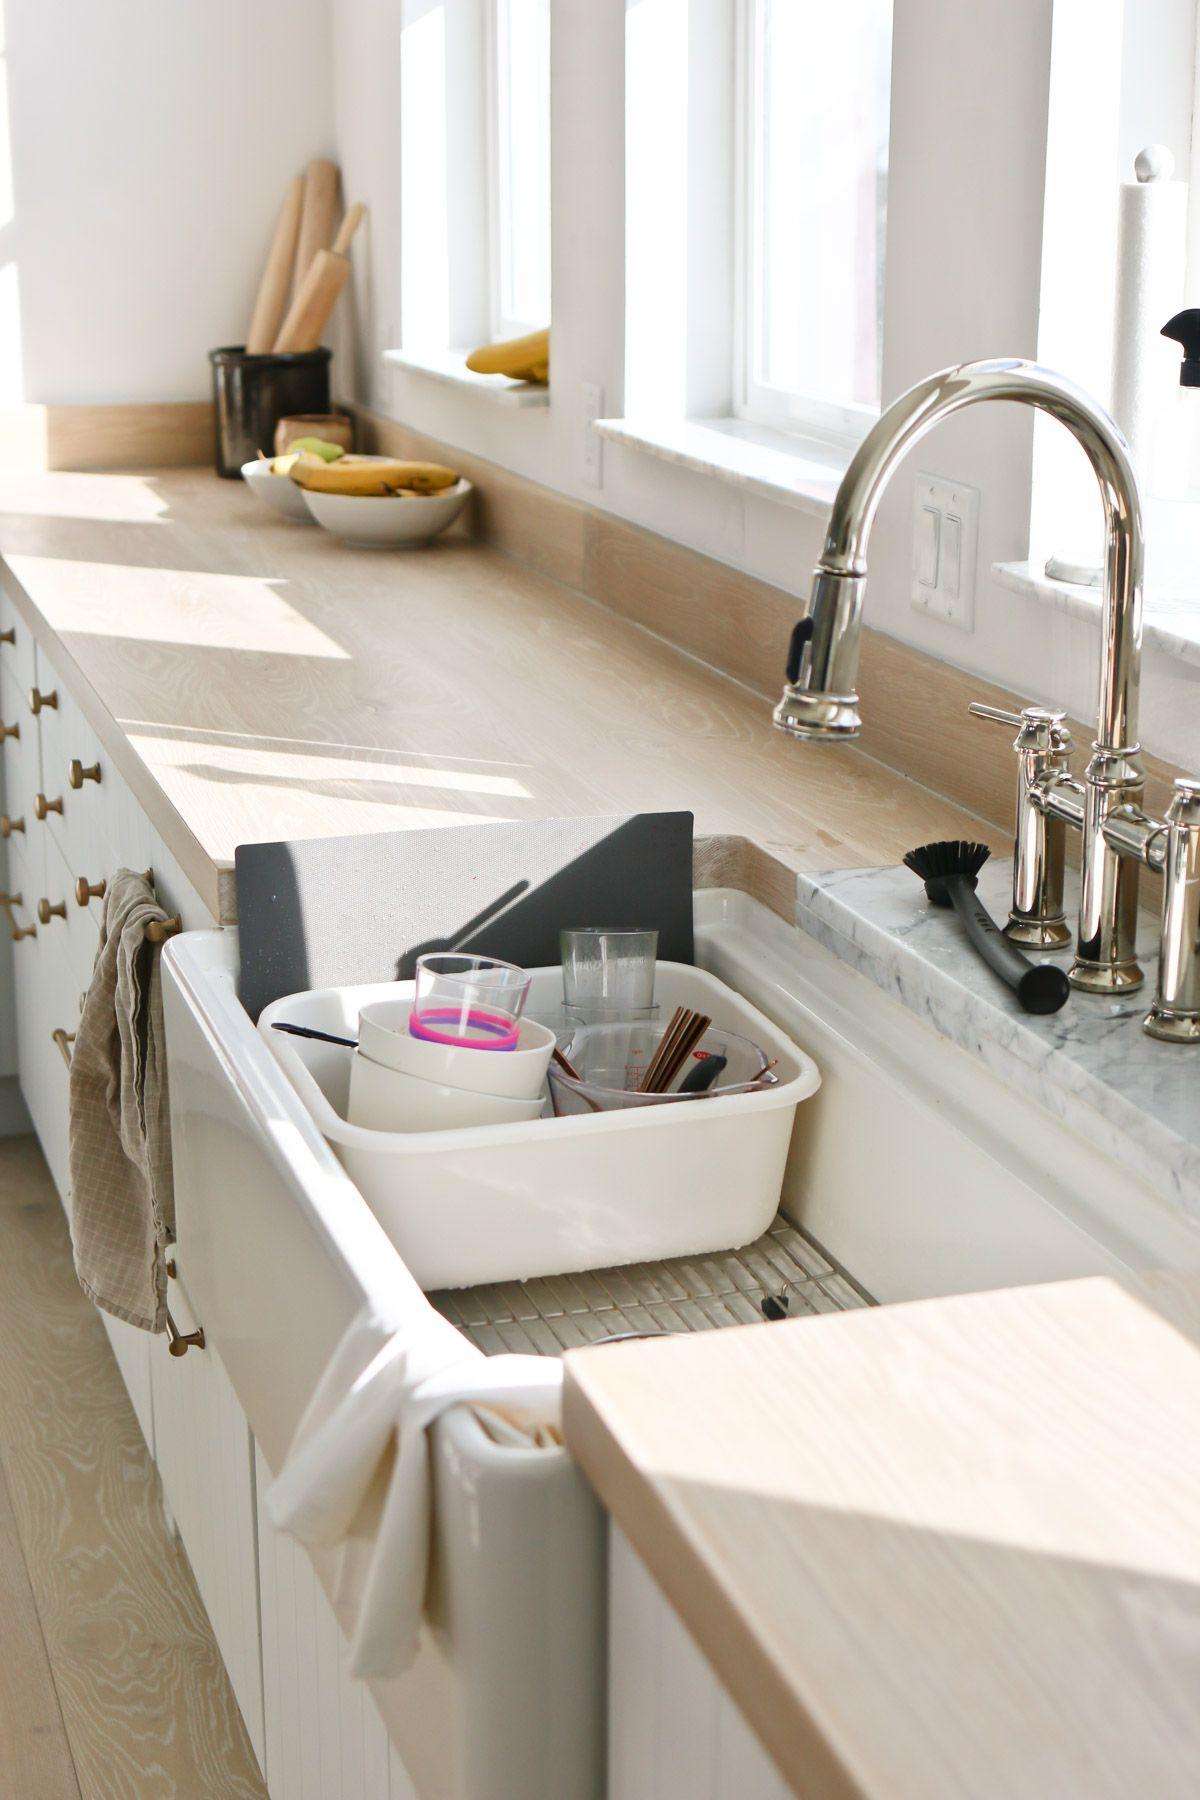 single basin kitchen sink